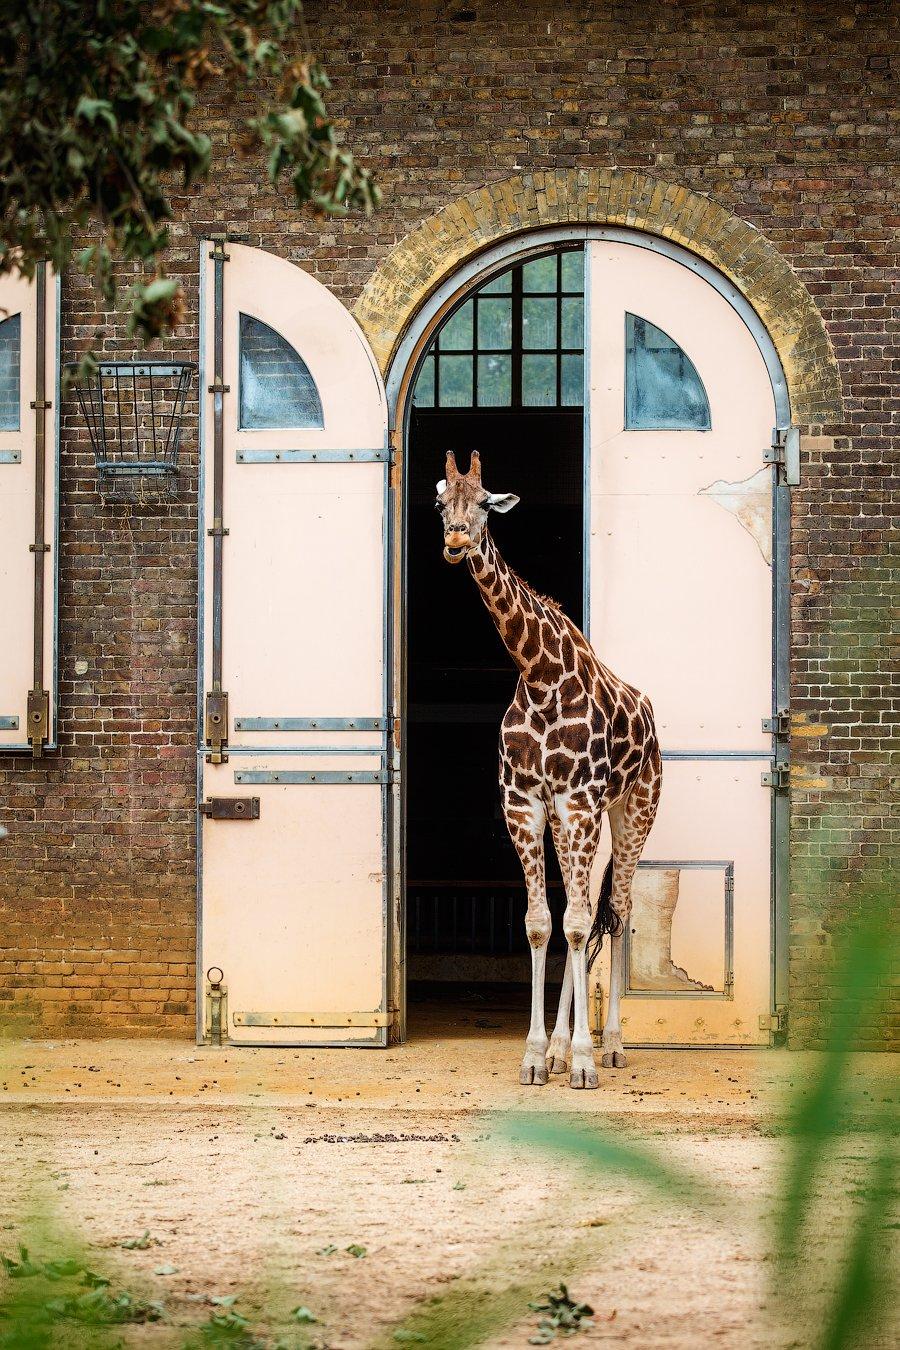 жираф, животные,Лондон,Англия,красота, мир, Оксана